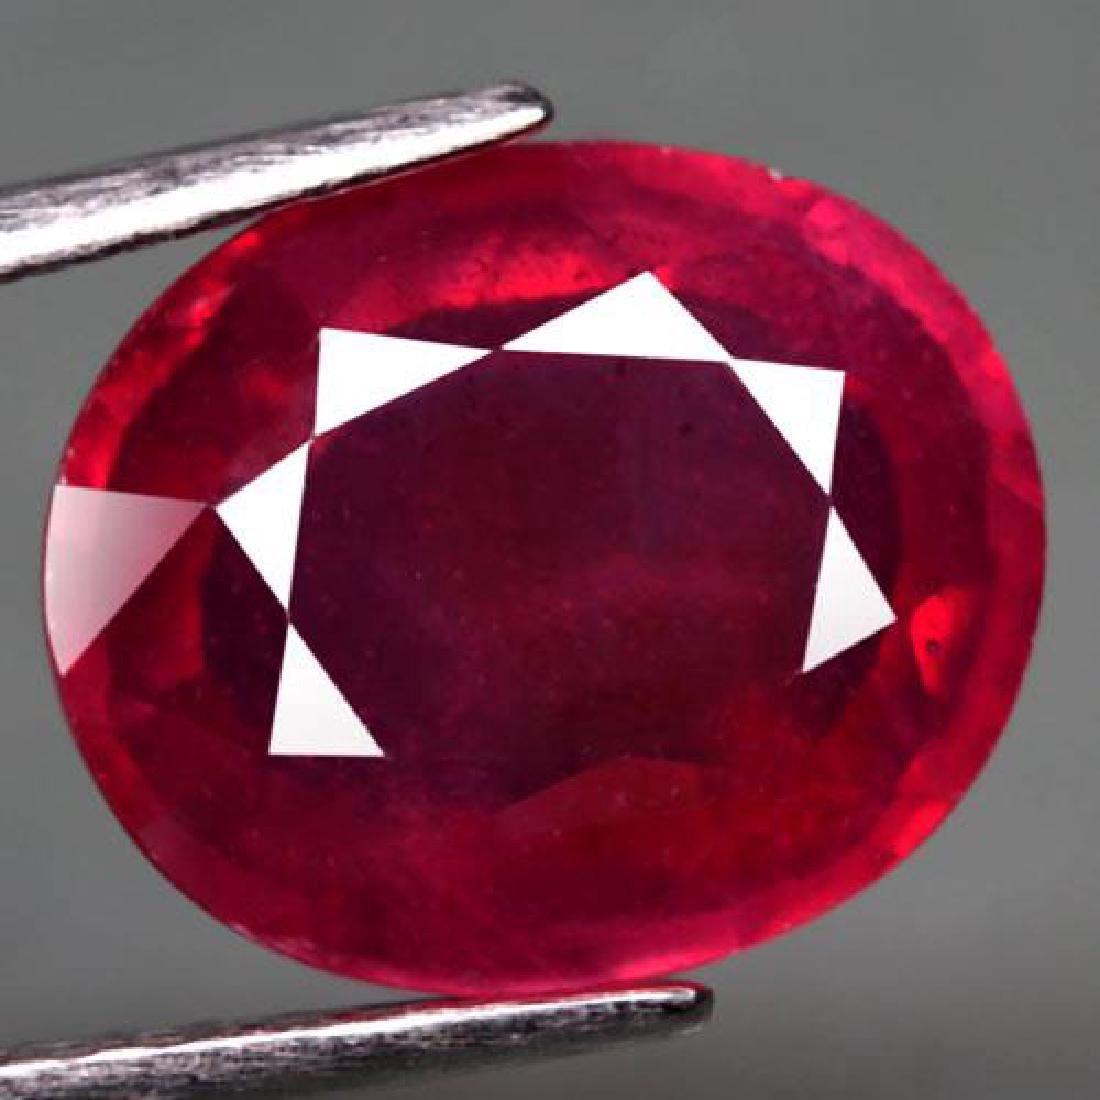 6.48 Carat Composite Loose Ruby